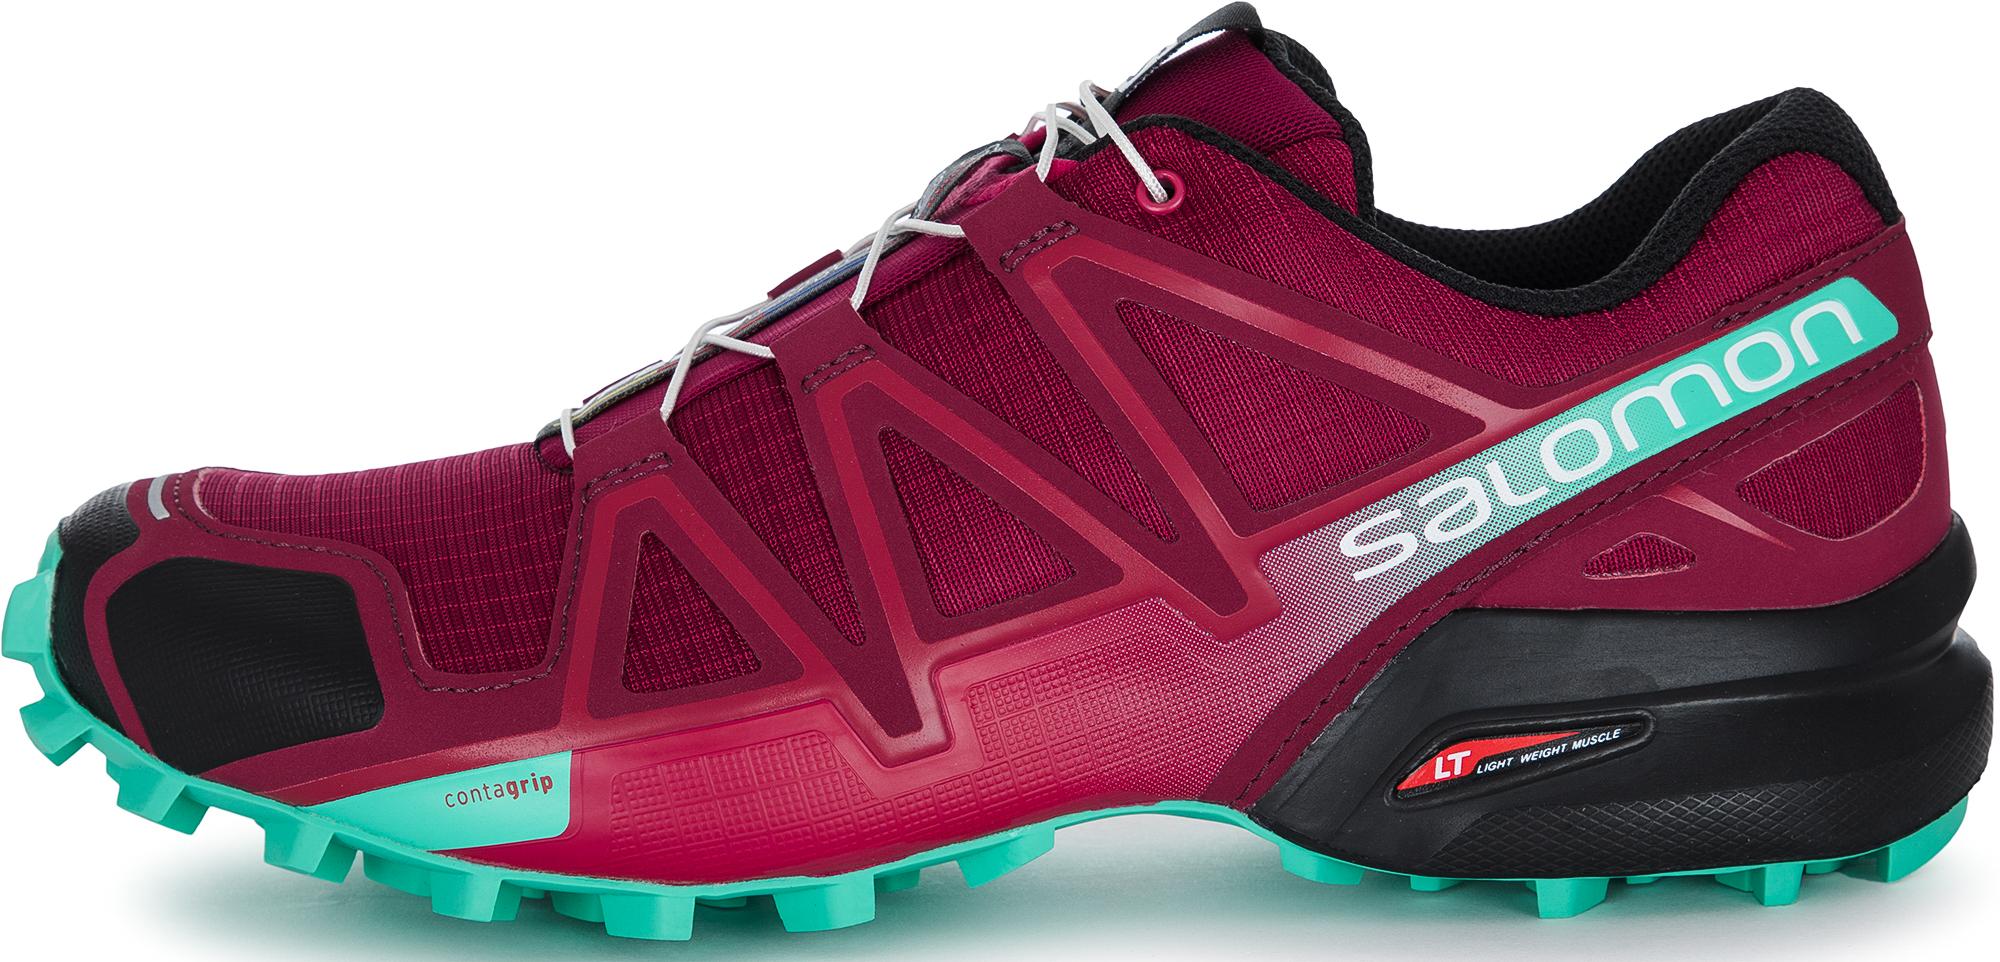 Salomon Кроссовки женские Salomon Speedcross 4, размер 40